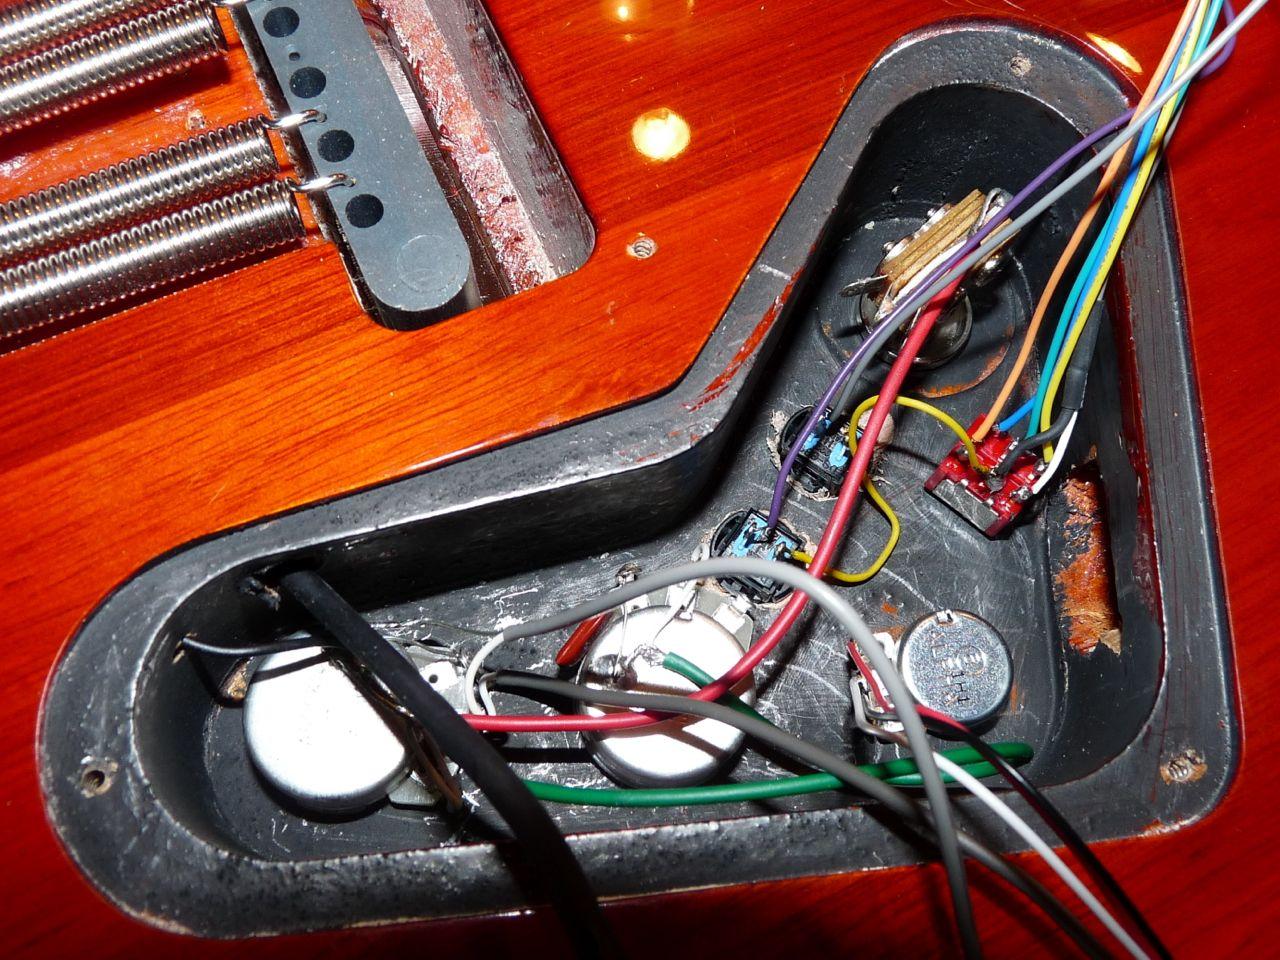 prs se custom 24 wiring completed wiring diagrams epiphone les paul wiring prs se custom 24 [ 1280 x 960 Pixel ]